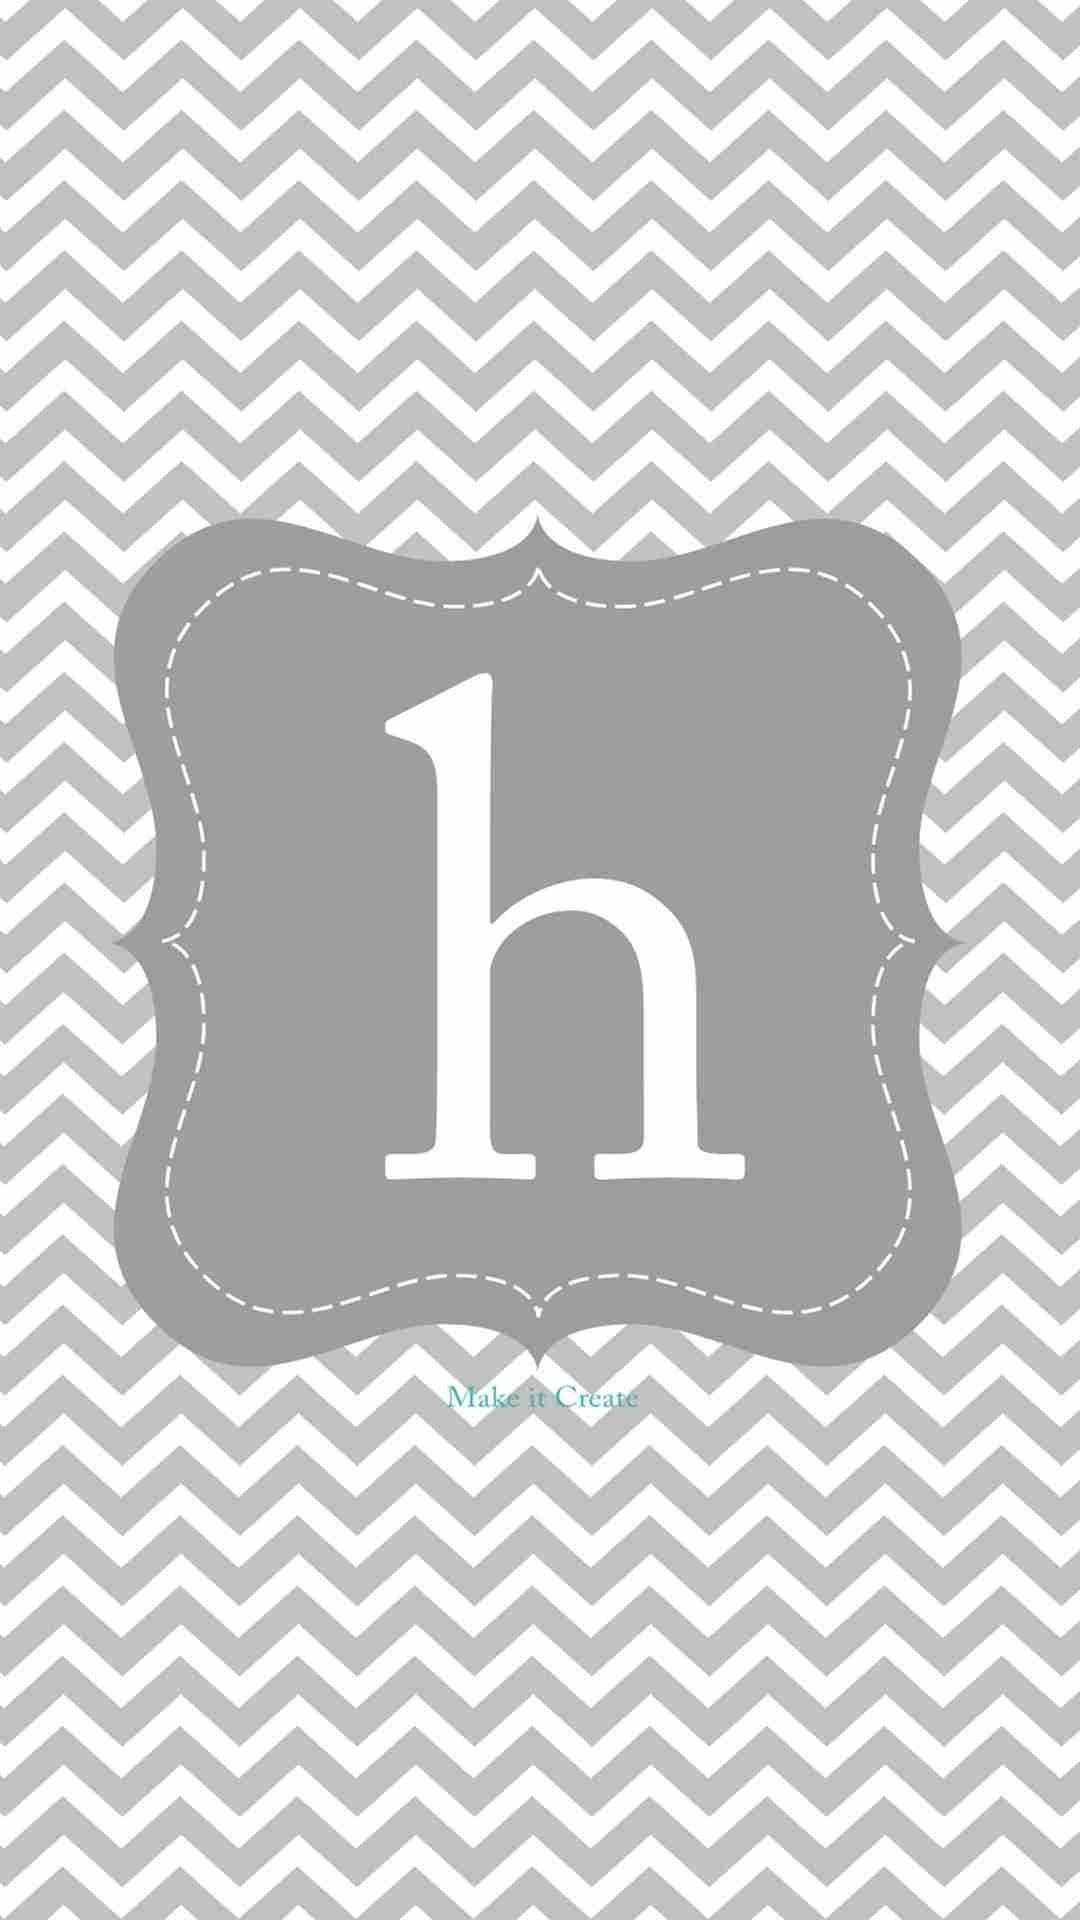 Make a Monogram Wallpaper (50+ images)